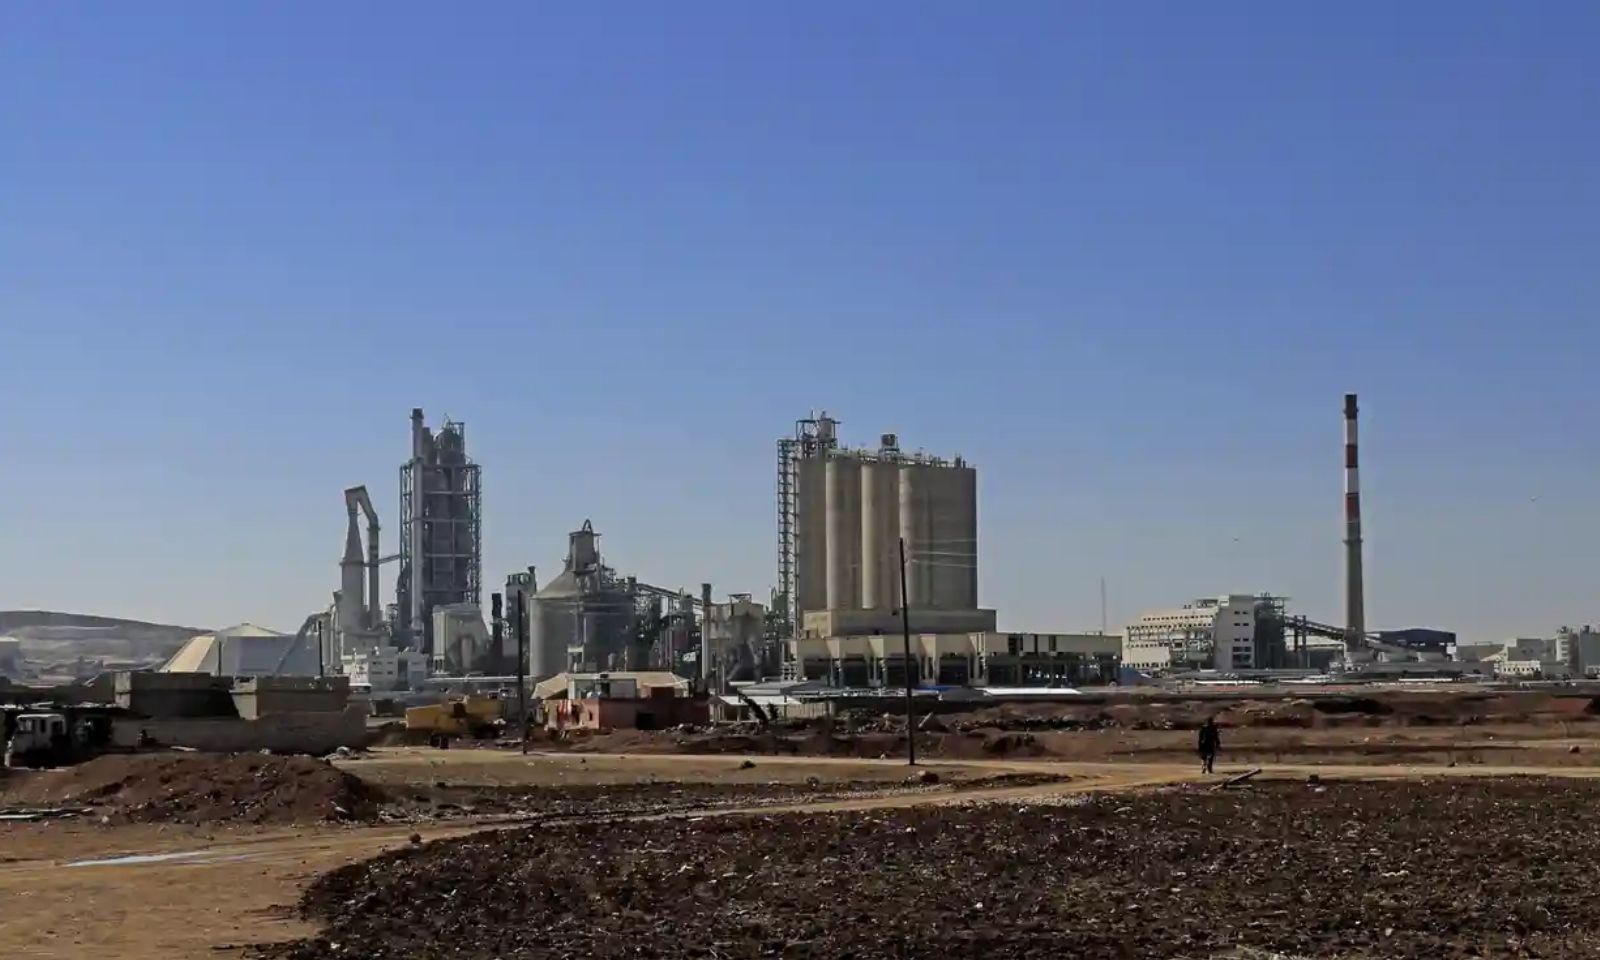 مصنع لافارج للإسمنت شمال شرقي سوريا (AFP)